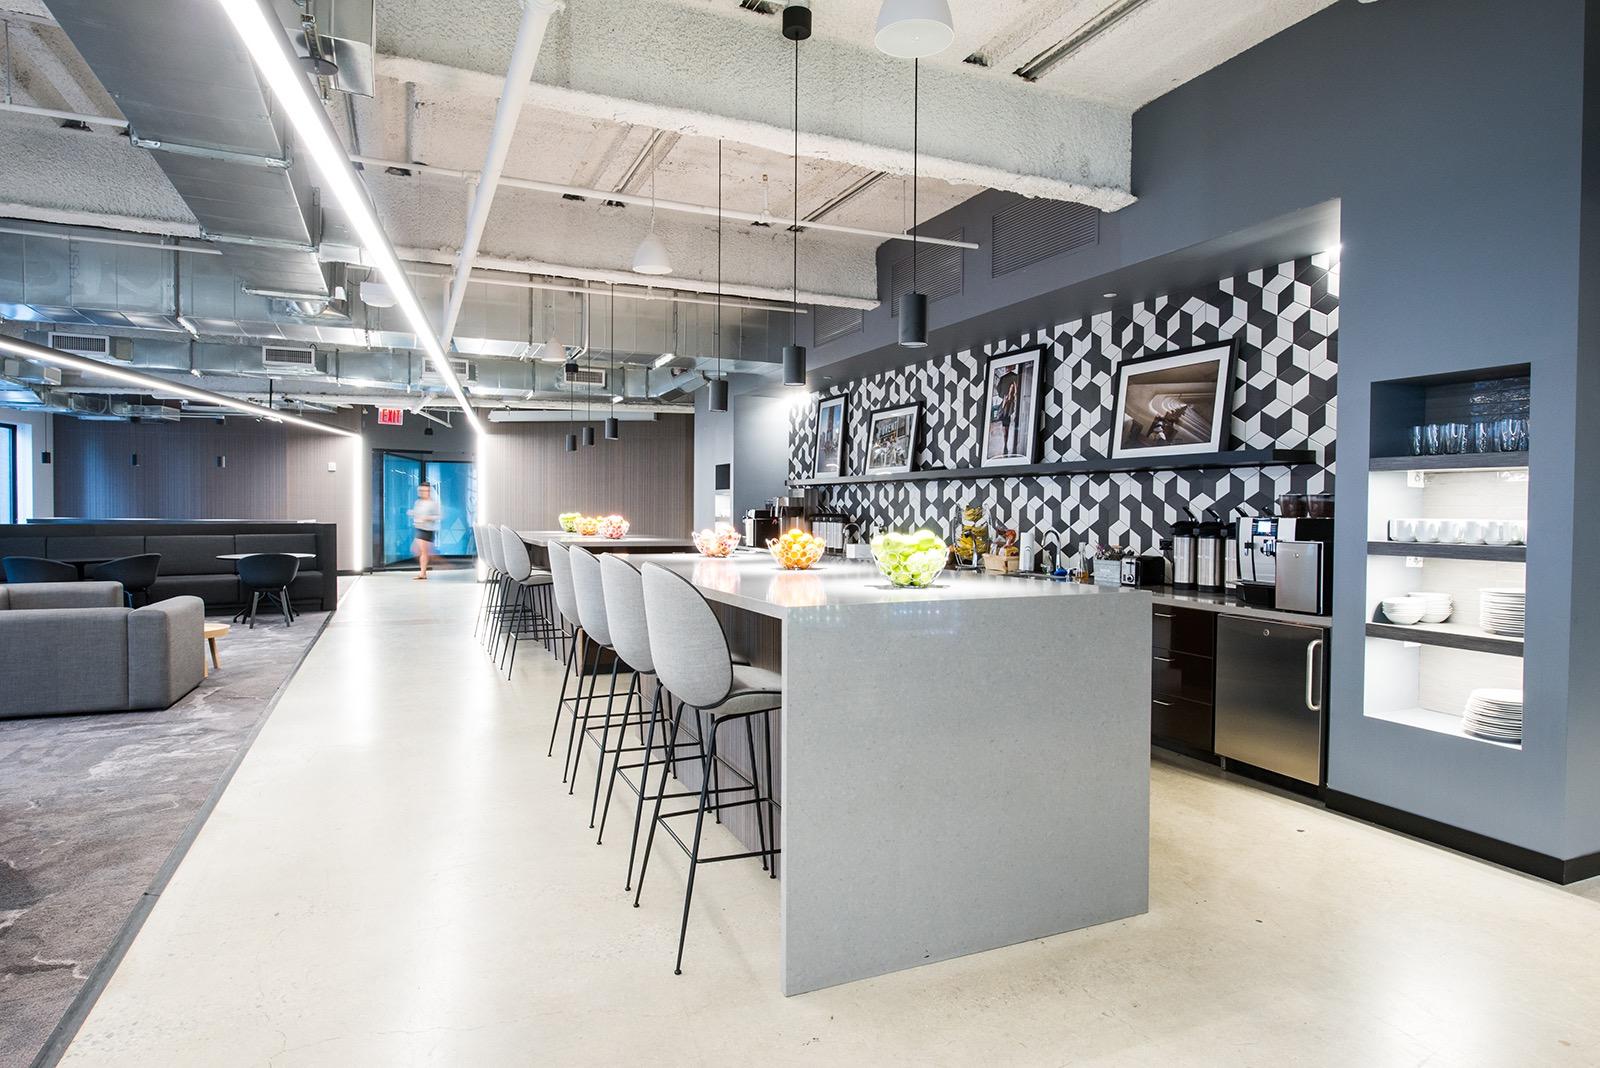 vox-media-nyc-office-6